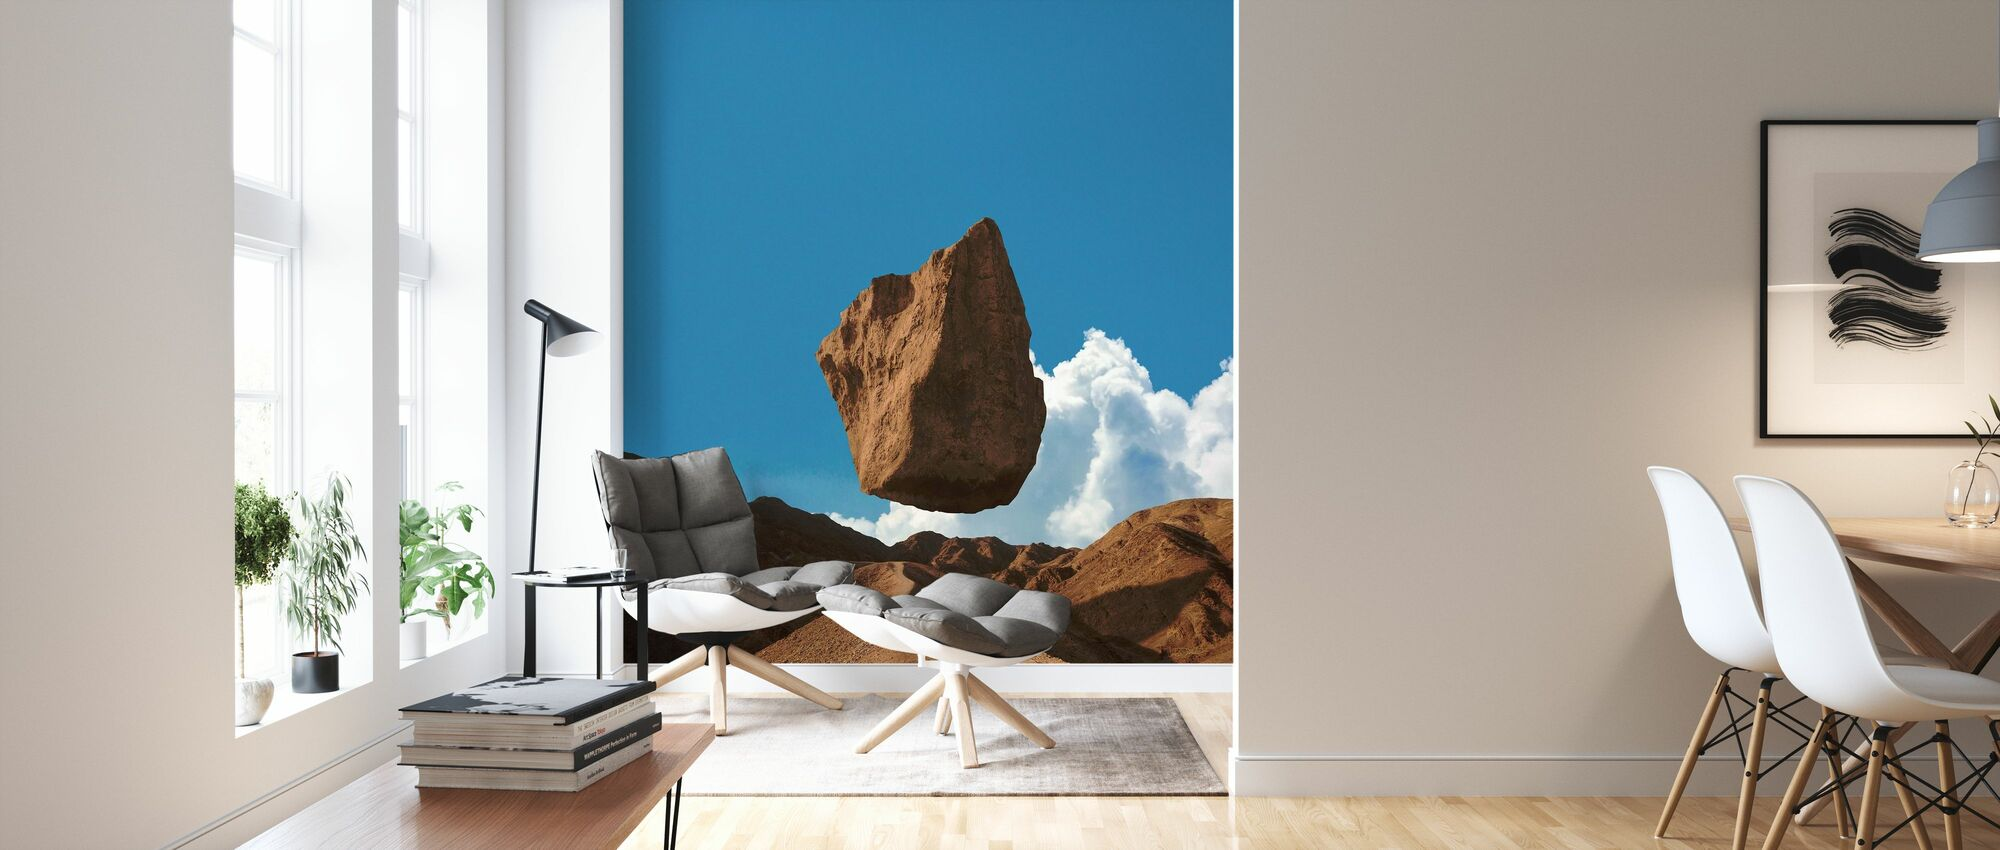 Floating Land - Wallpaper - Living Room